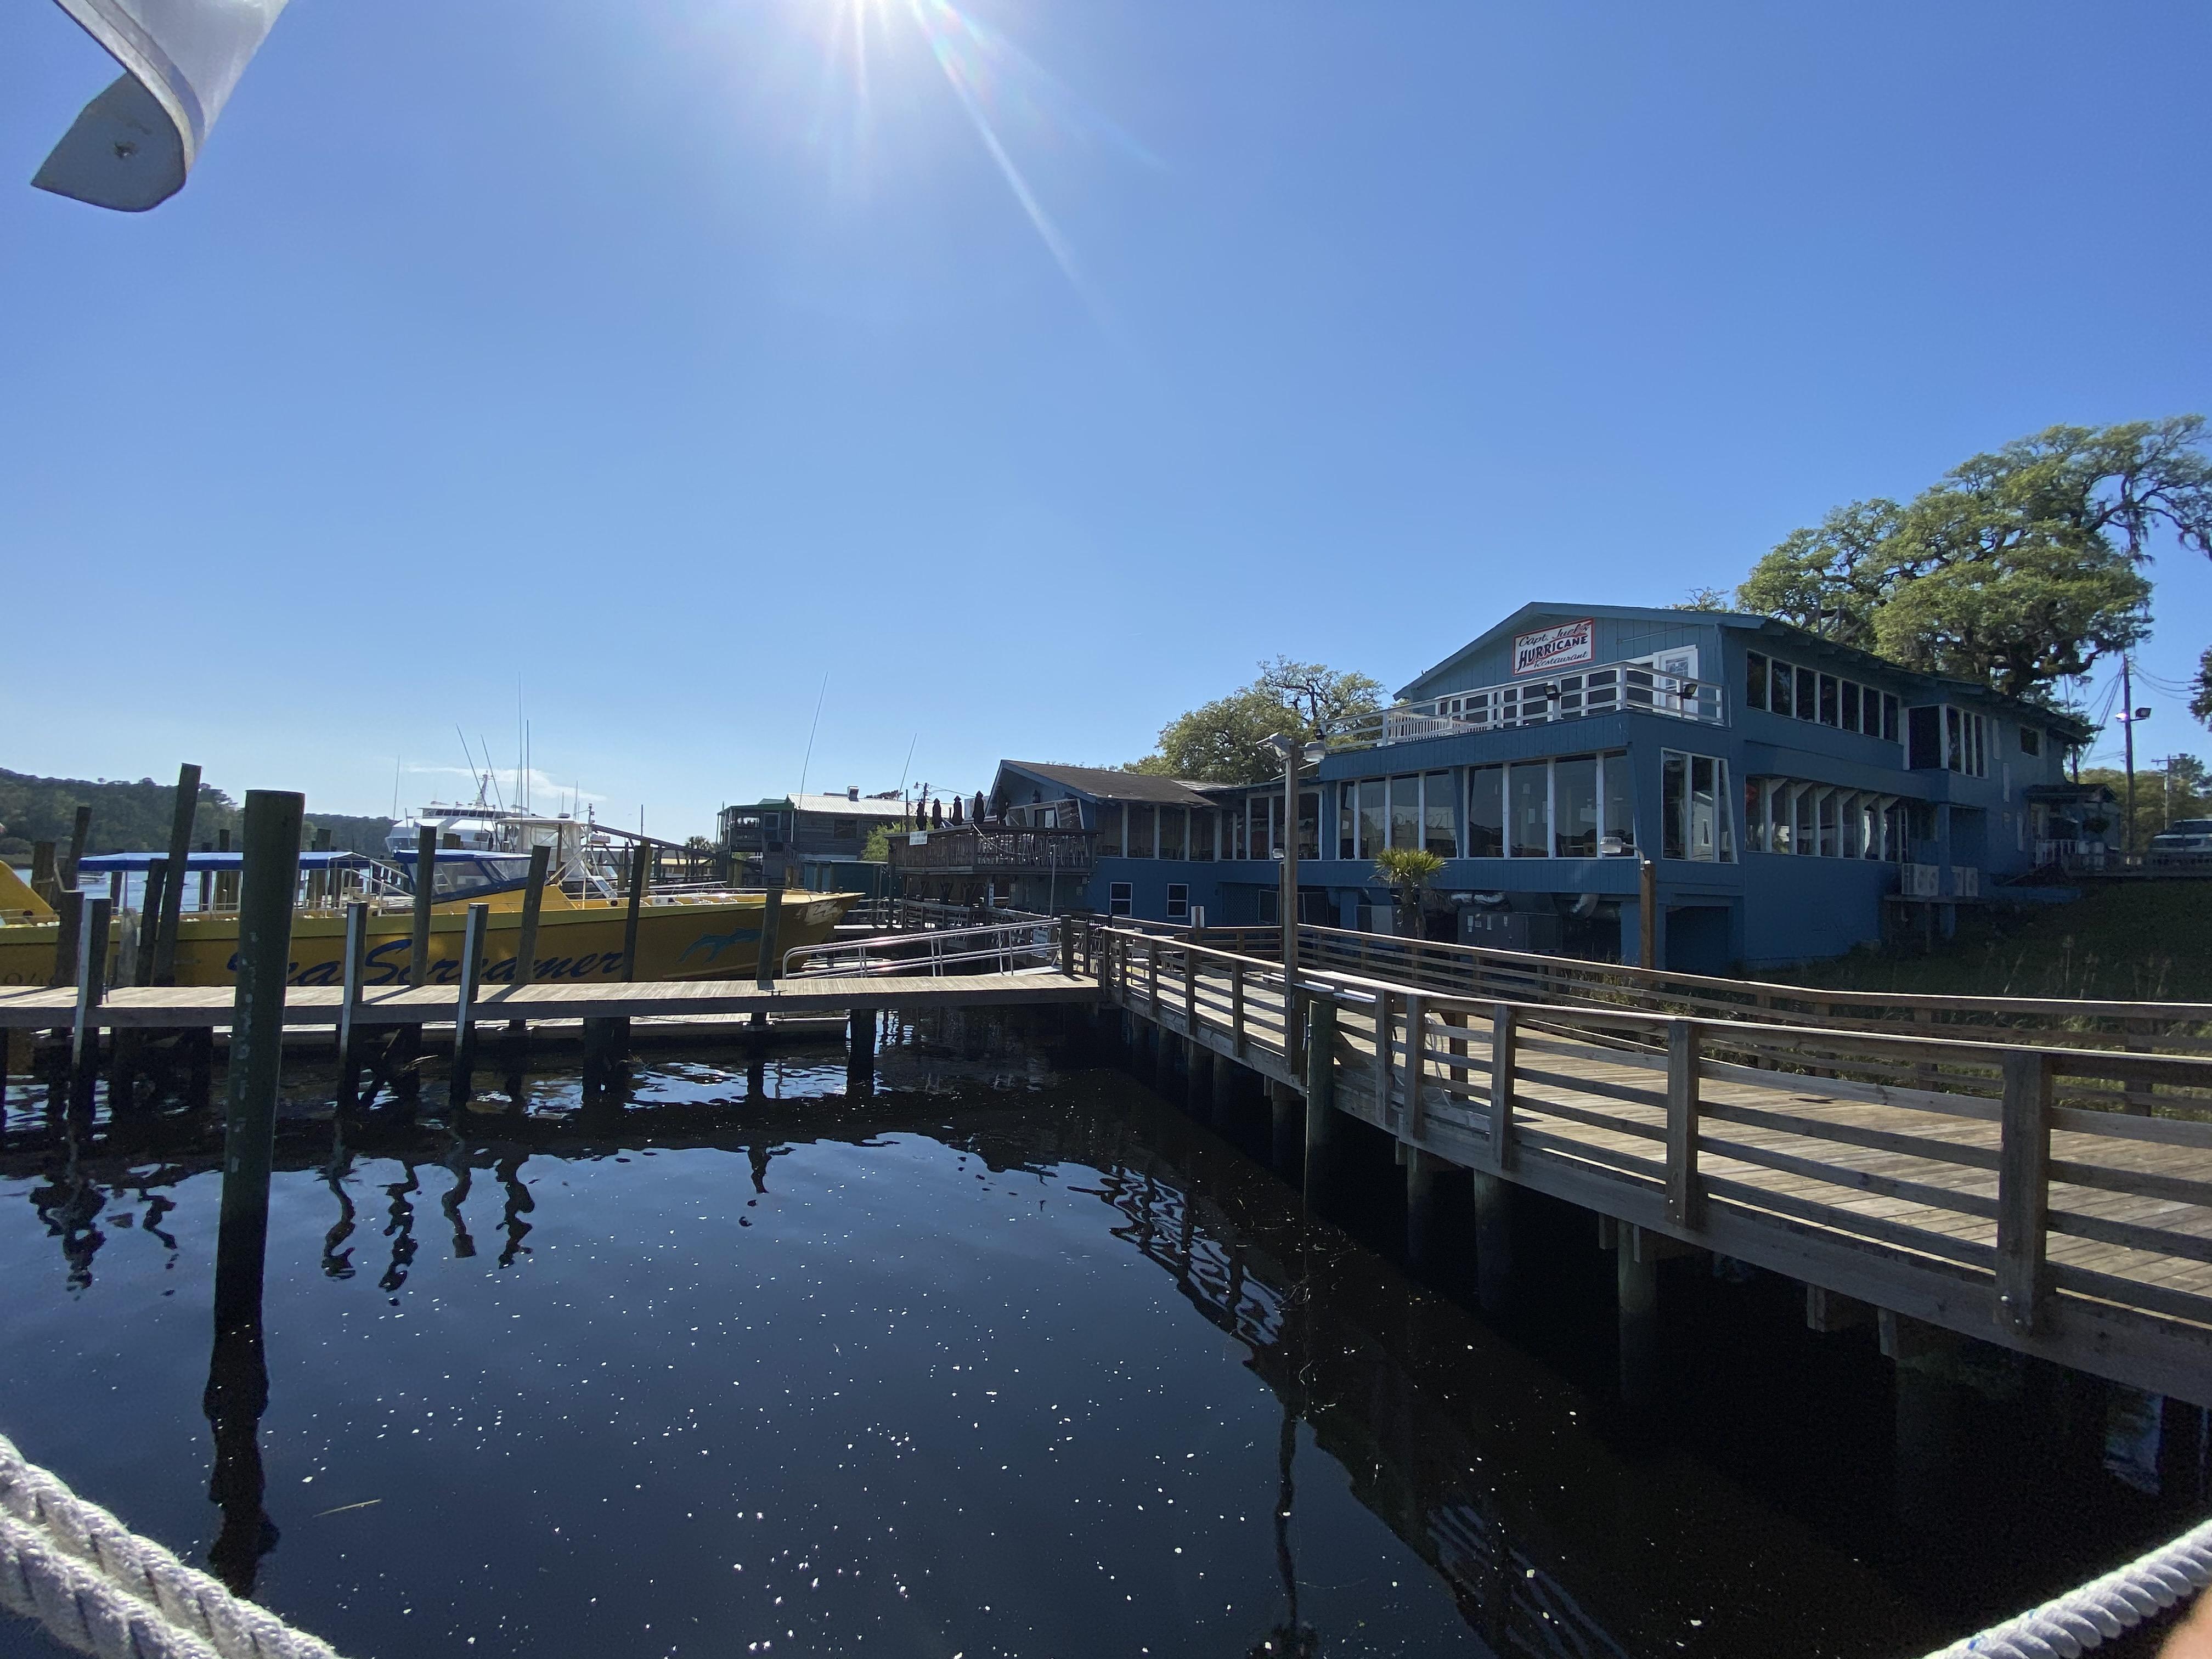 Capt. Juel's Hurricane Restaurant - Little River Waterfront